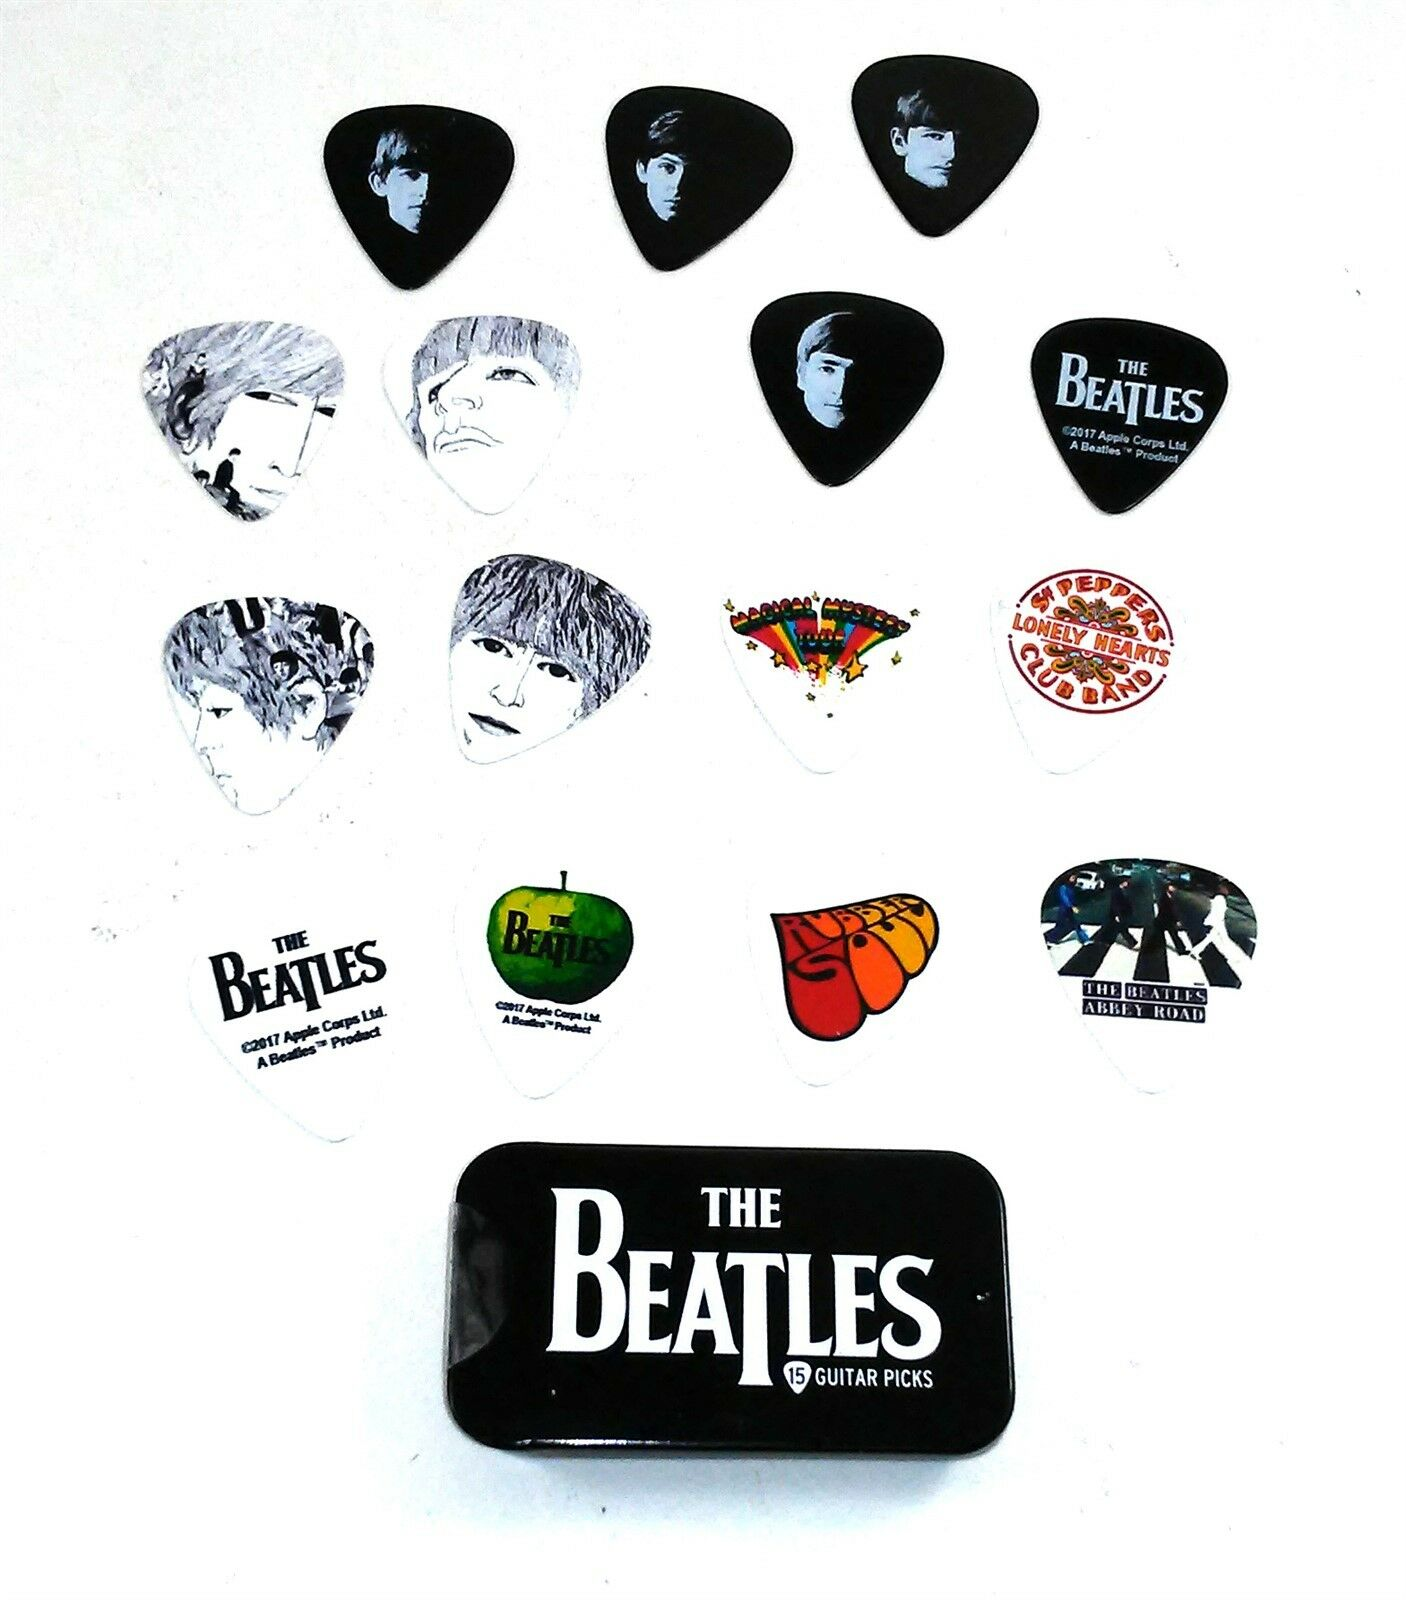 Beatles 15 Guitar Picks Signature Series Stripe Tin Planet Waves 1CAB4-15BT2